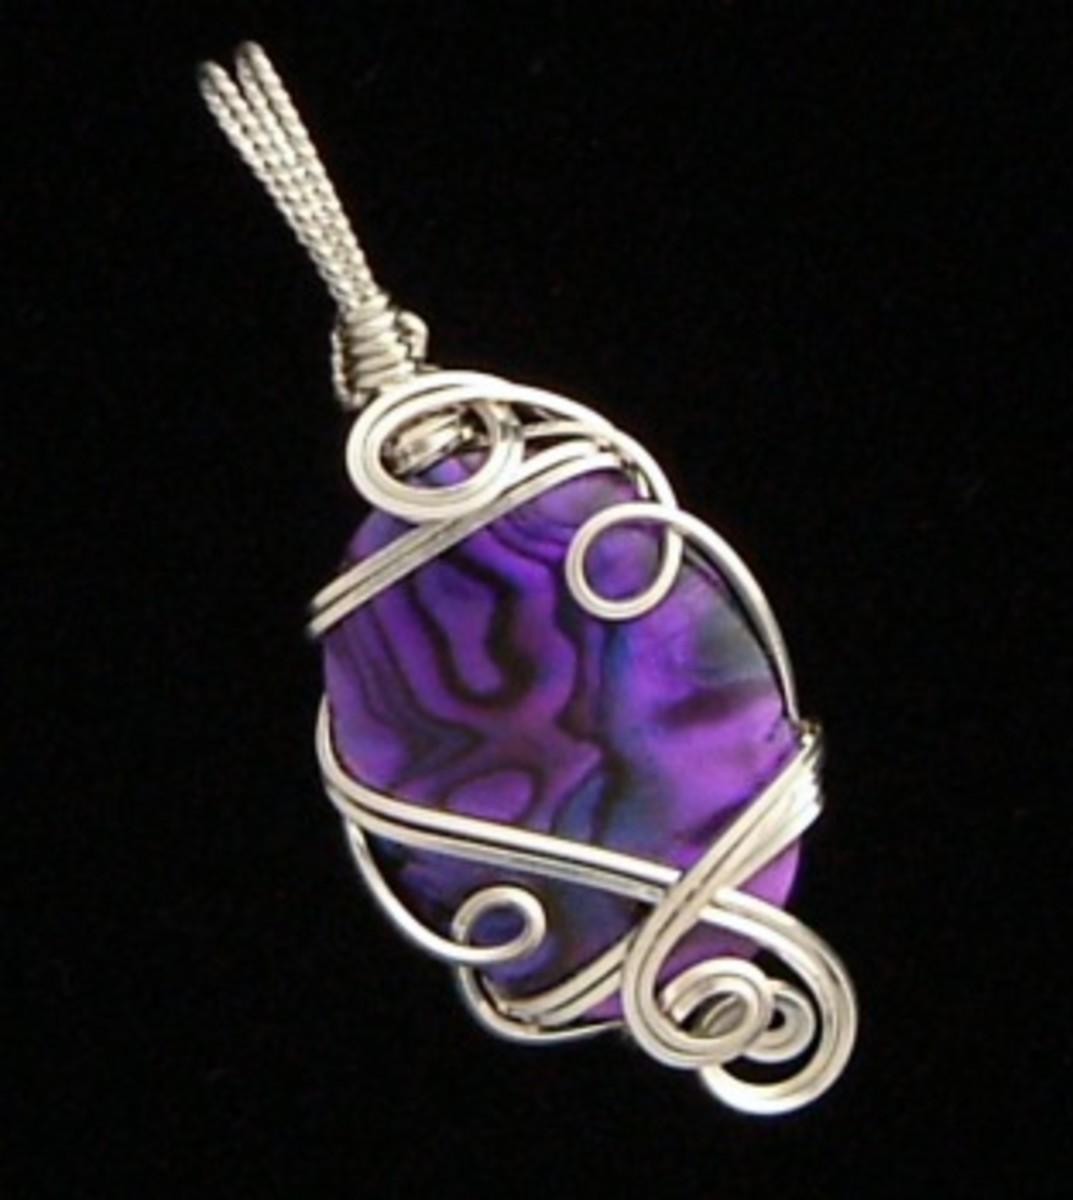 Bunda Jewelry Appraisers, New York, NY